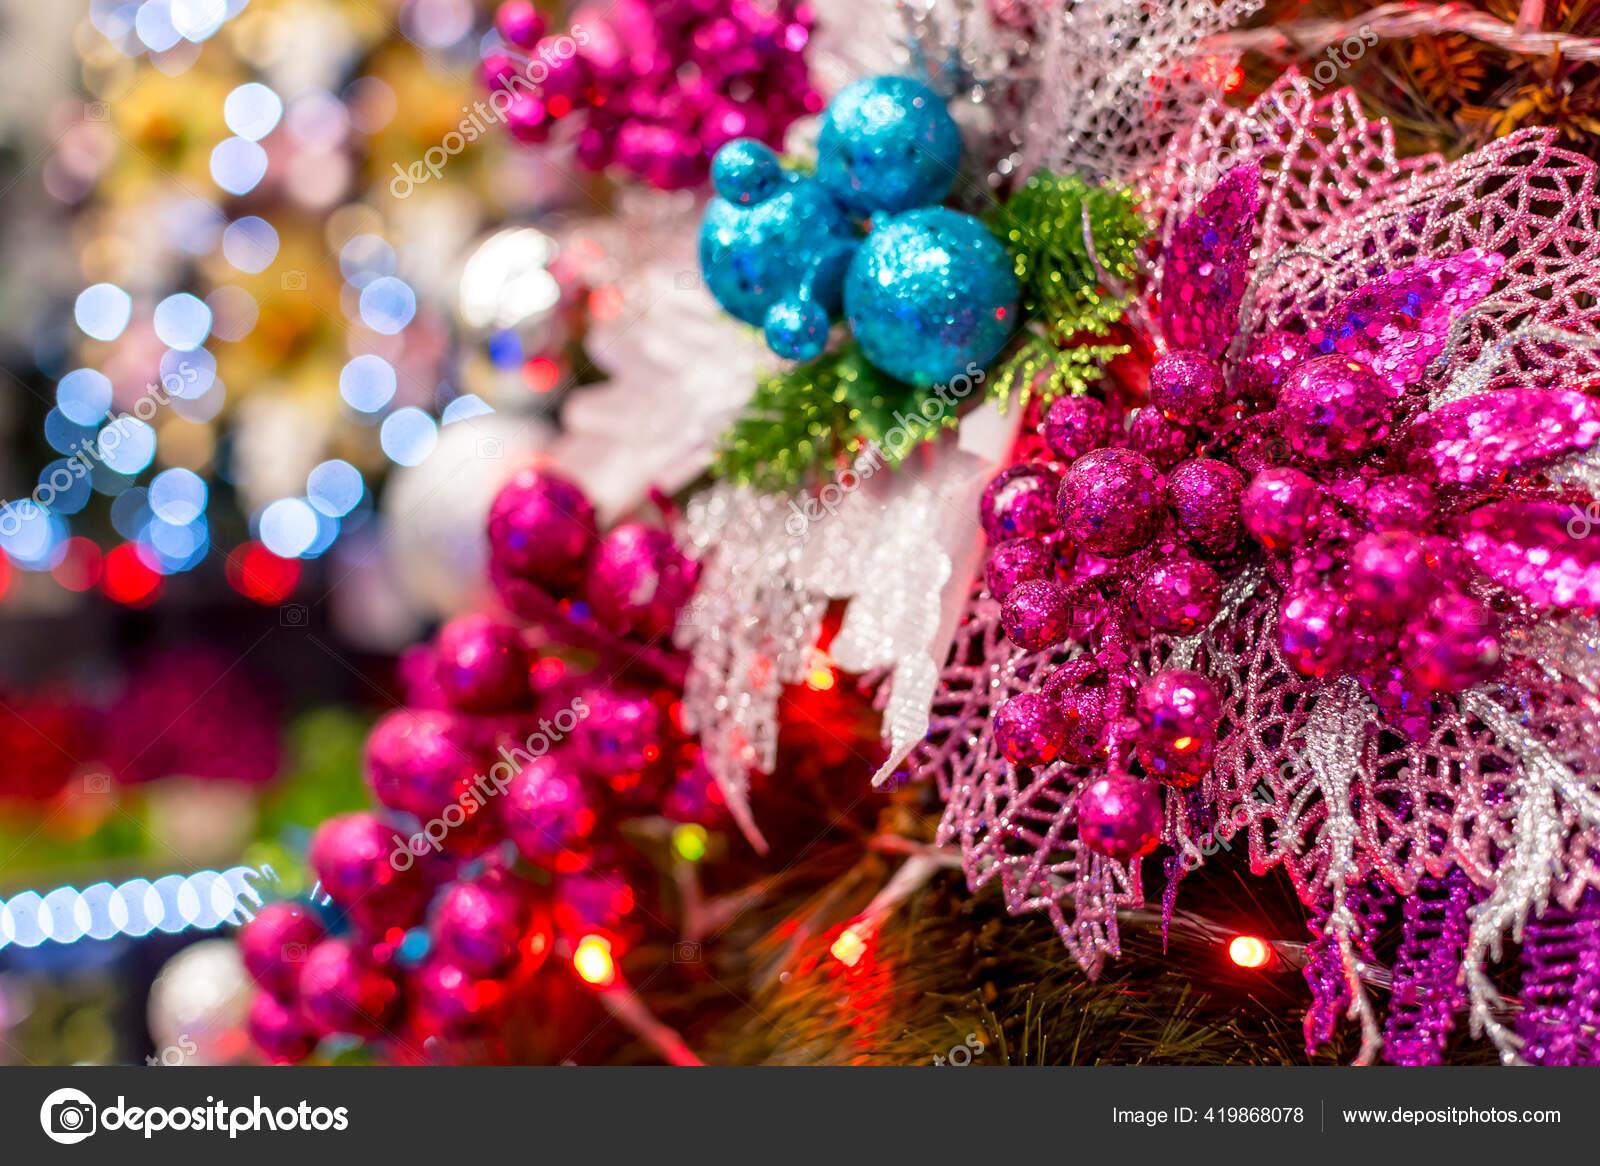 Closeup Pink Blue Christmas Ornaments Decorated Geneva Style Christmas Tree Stock Photo C Mikeedwards 419868078